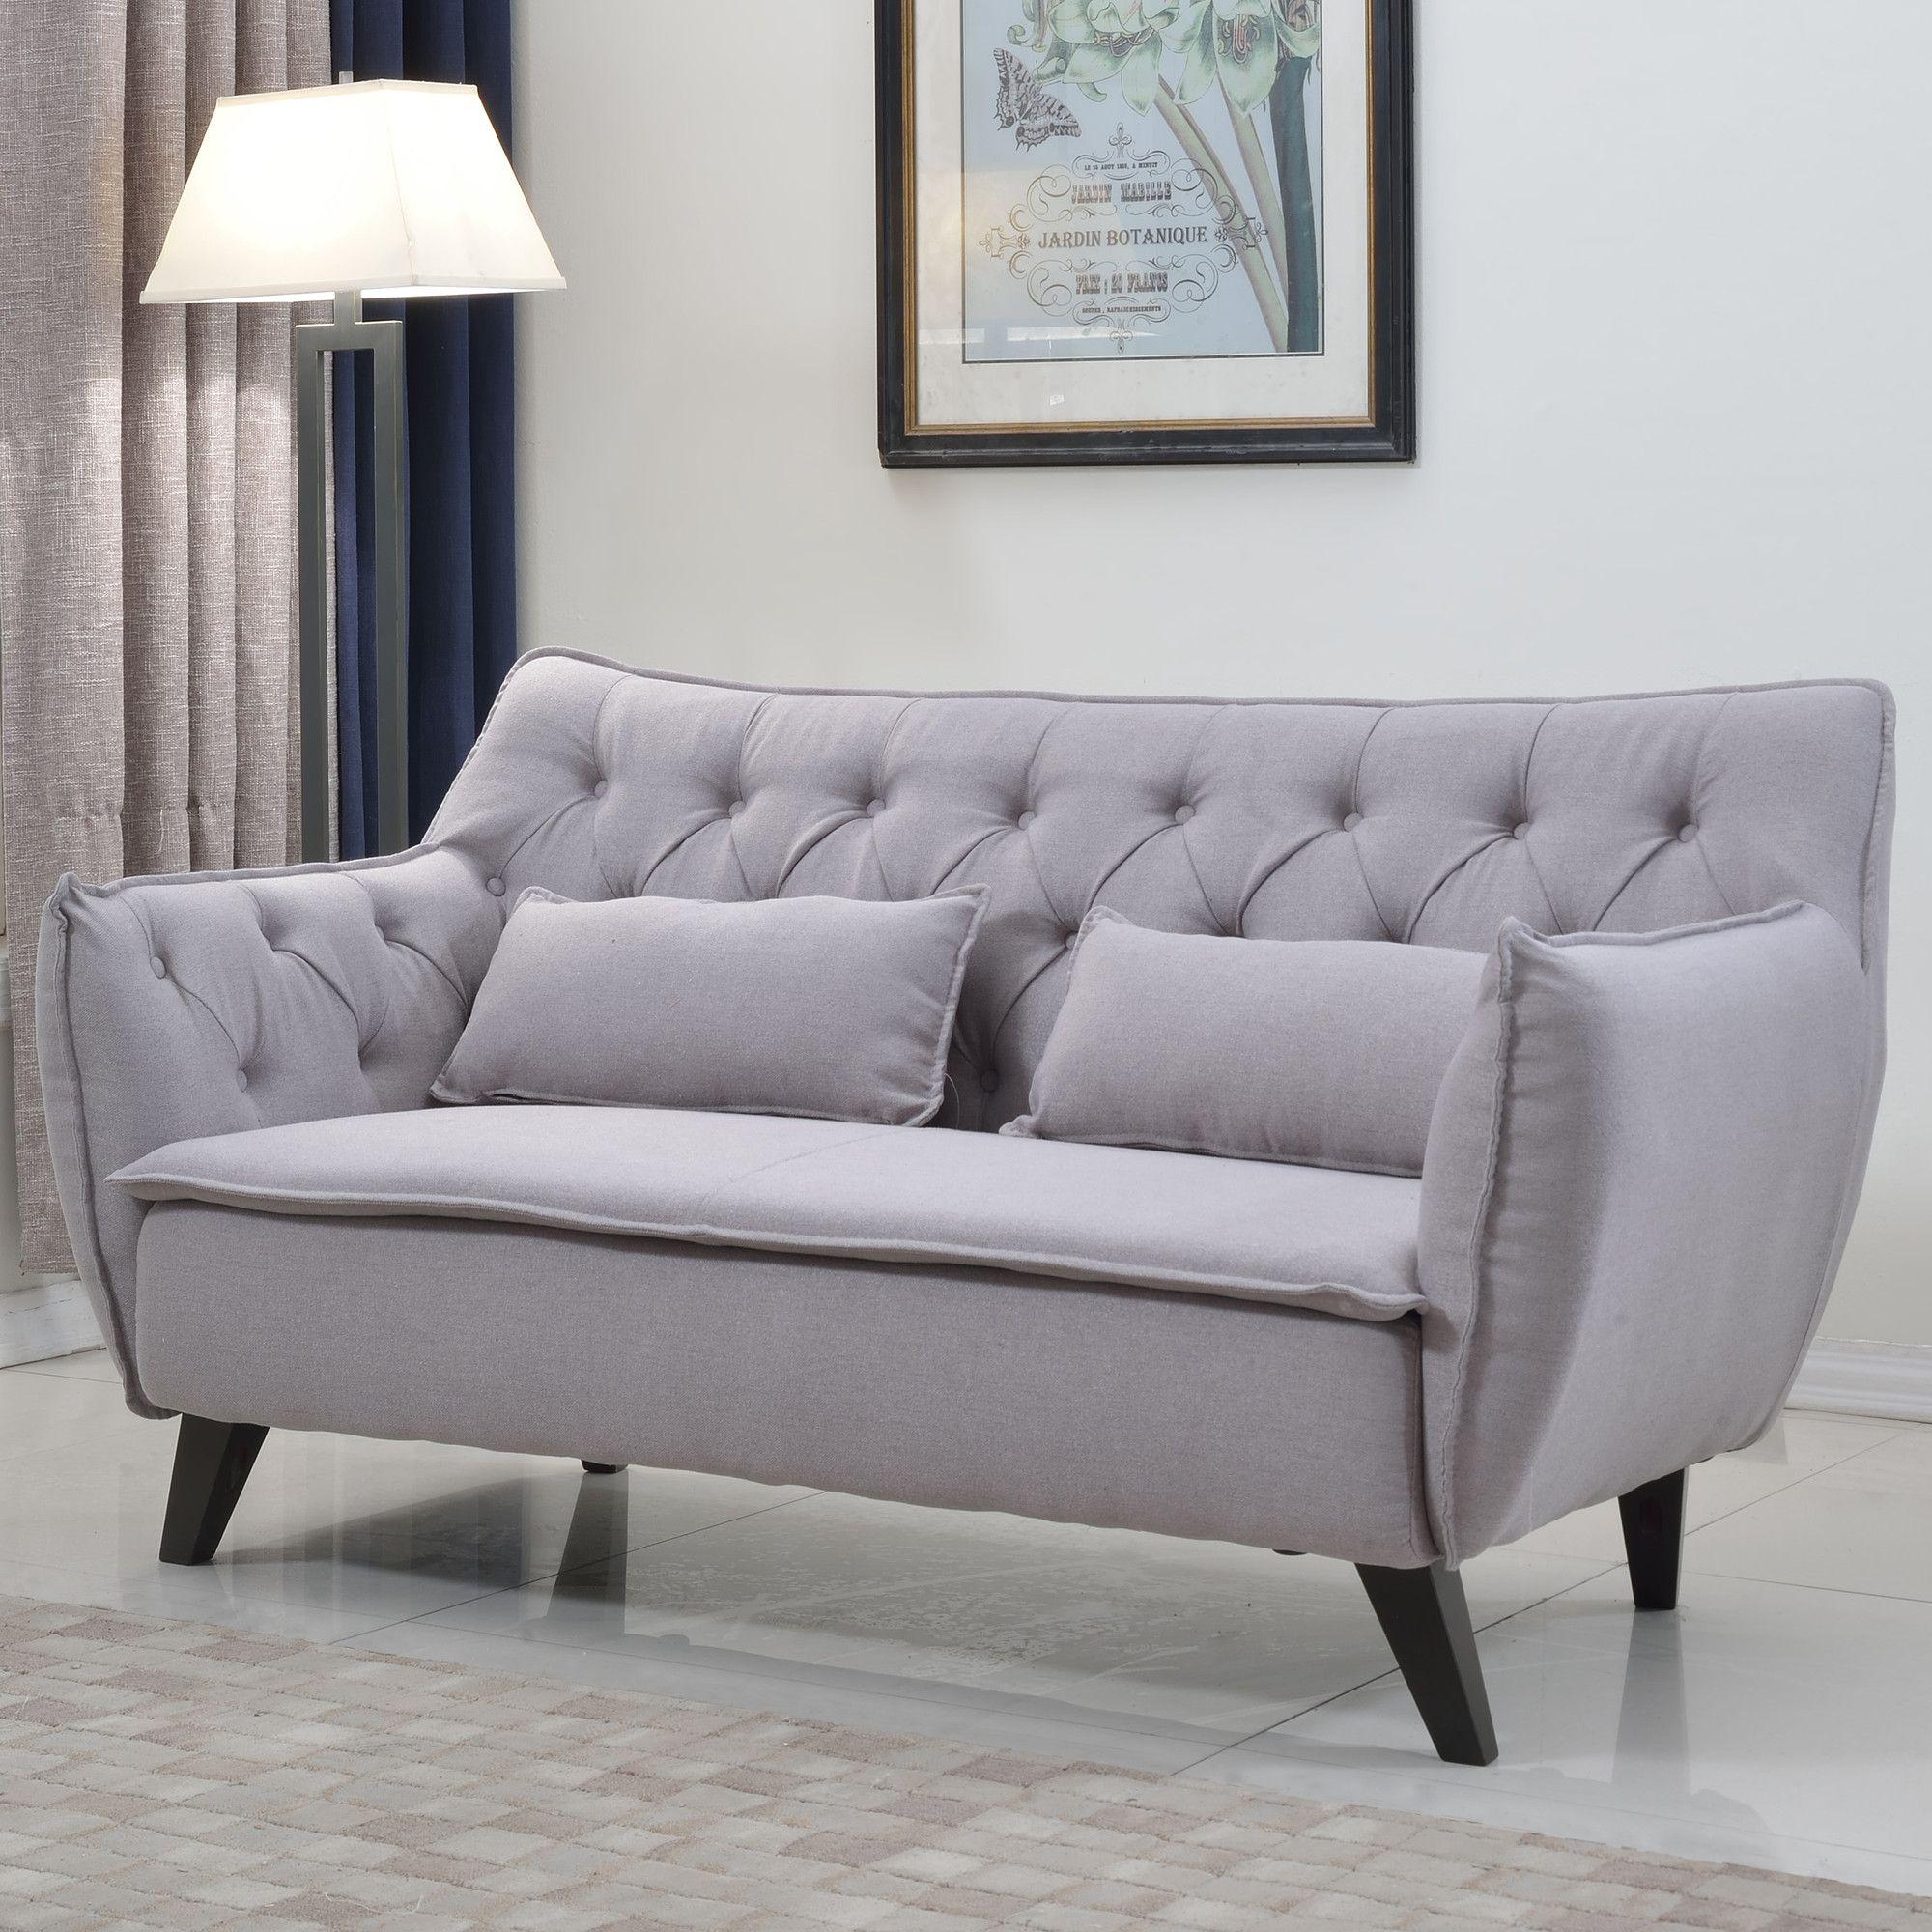 mid century modern loveseat products living room furniture rh pinterest com